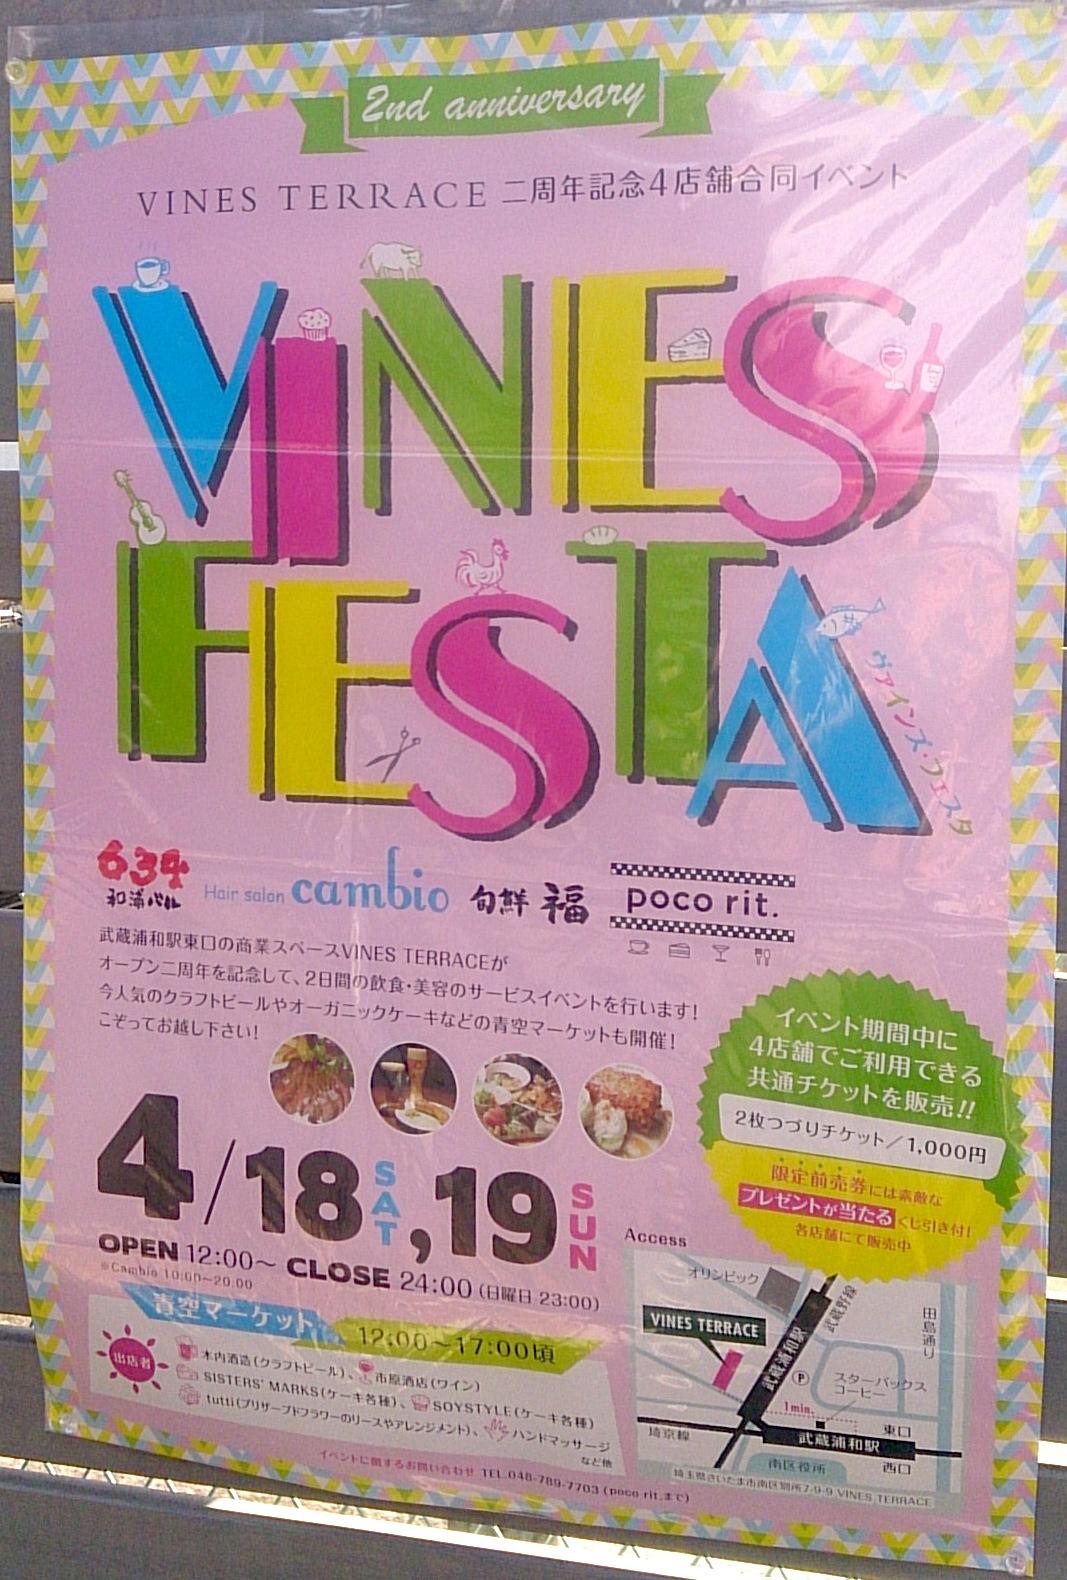 VINES FESTA